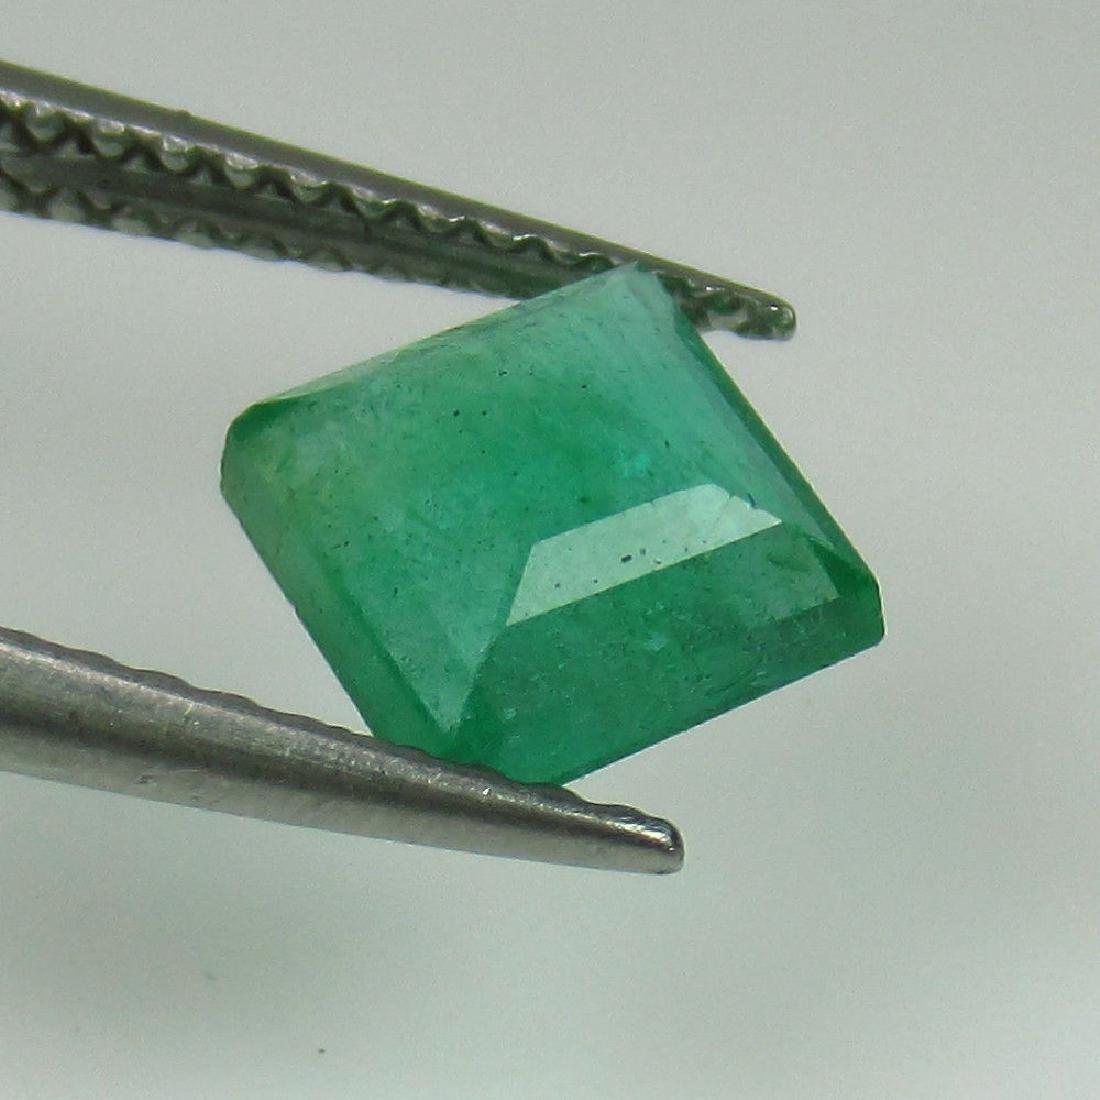 1.19 Ct Genuine Zambian Emerald 6.2X6.2 mm Square Cut - 2